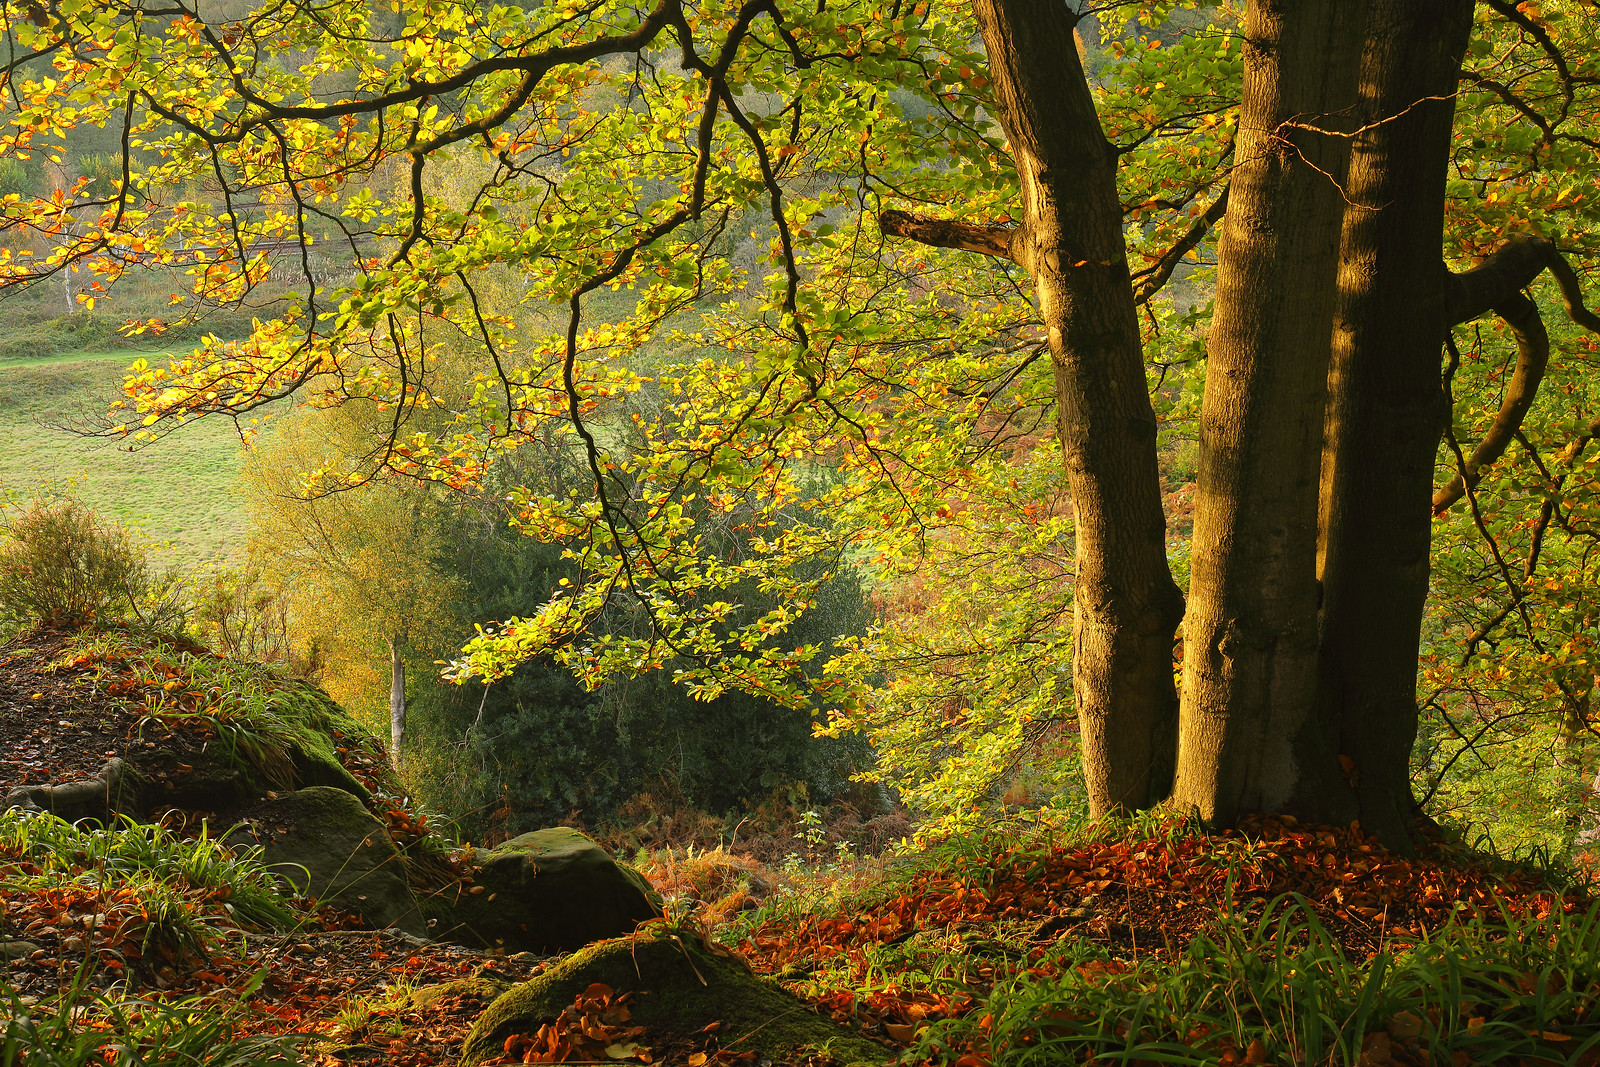 Clifftop beech trees in autumn